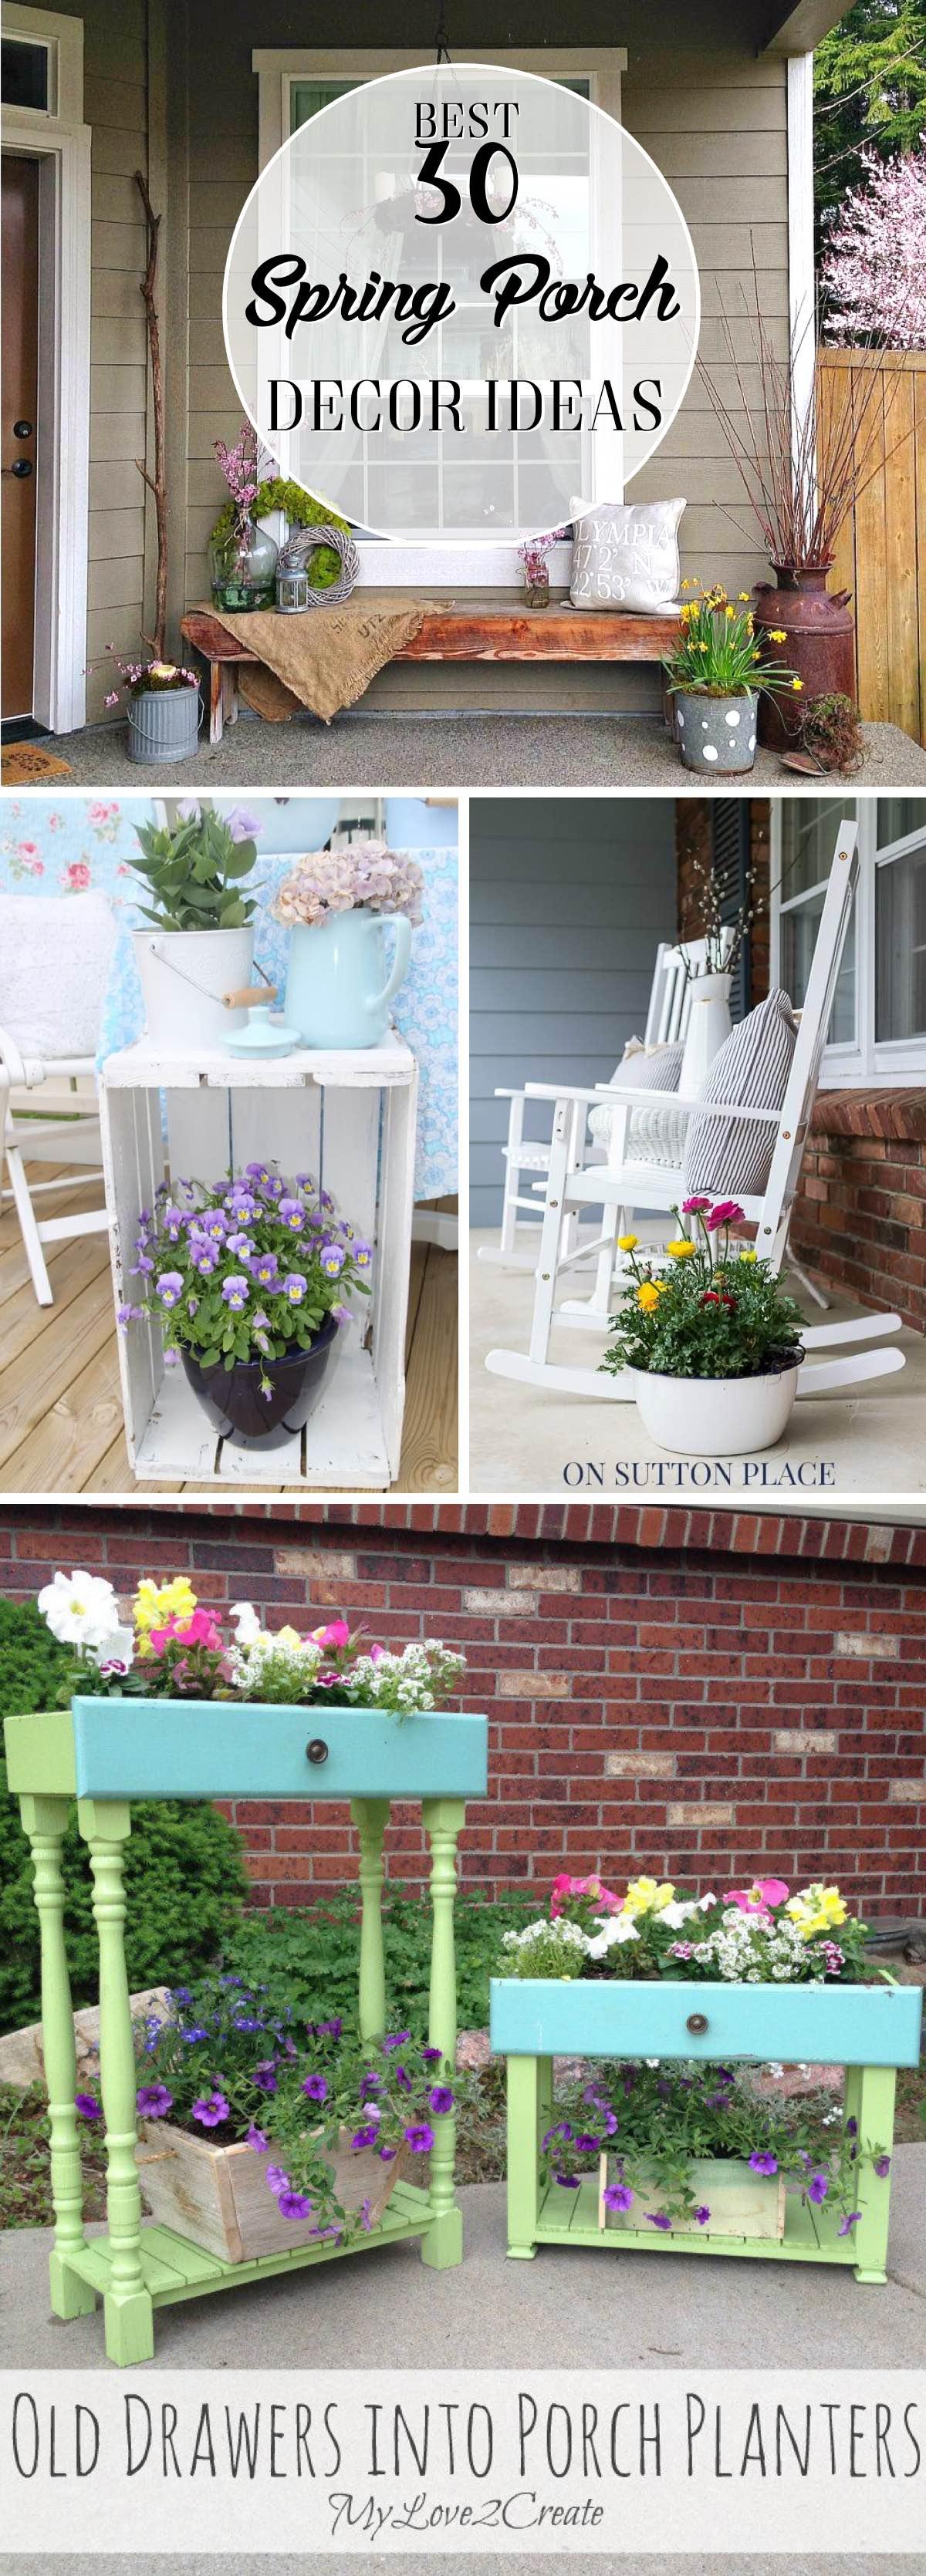 Diy Wreaths For Front Door Farmhouse